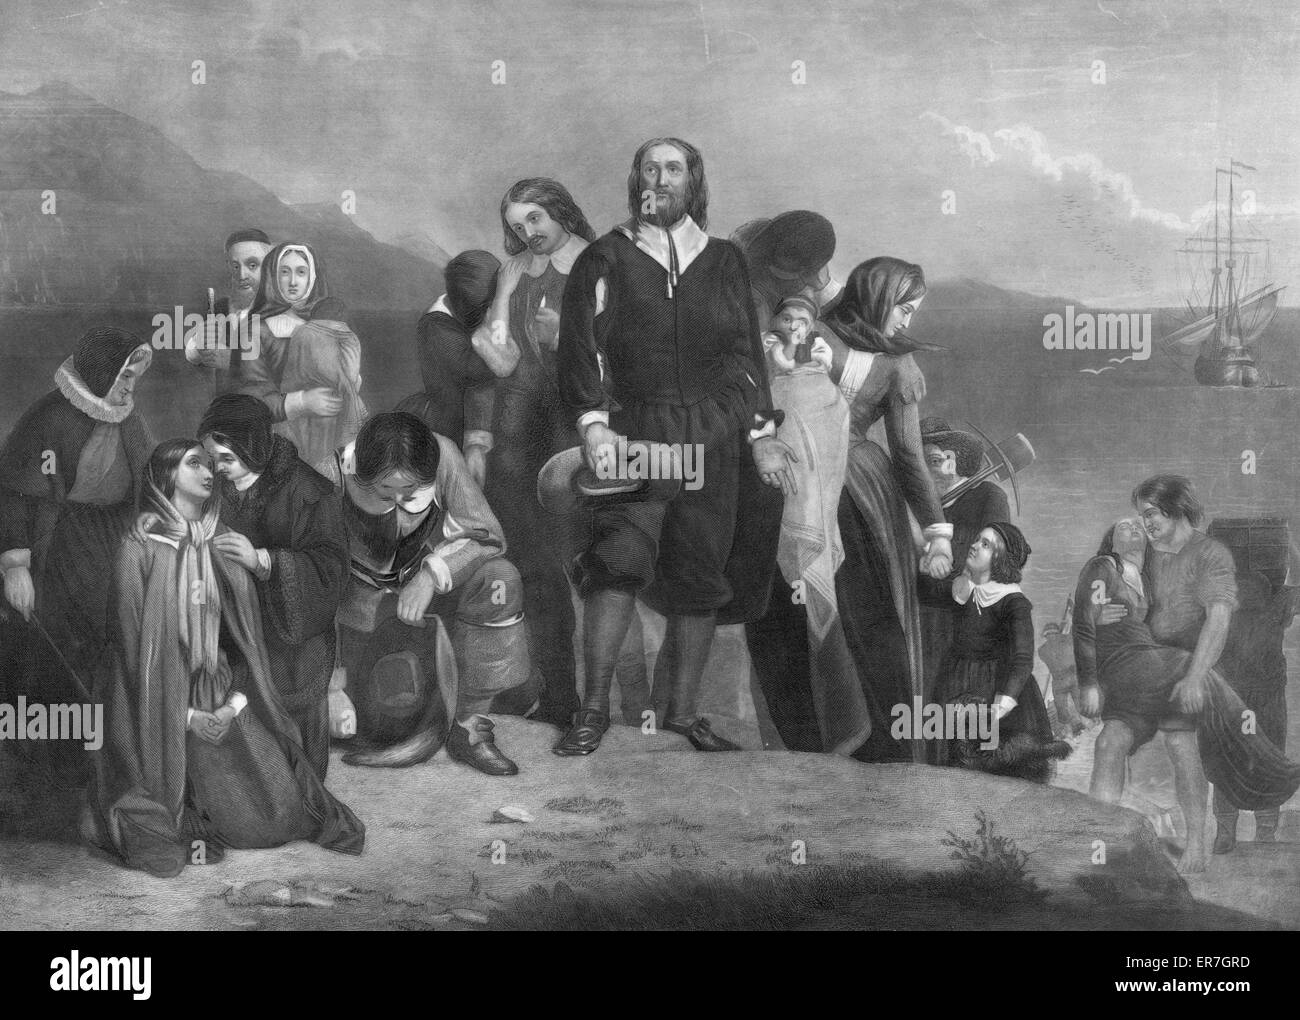 Die Landung der Pilgerväter in Amerika. N. CHR. 1620. Stockfoto